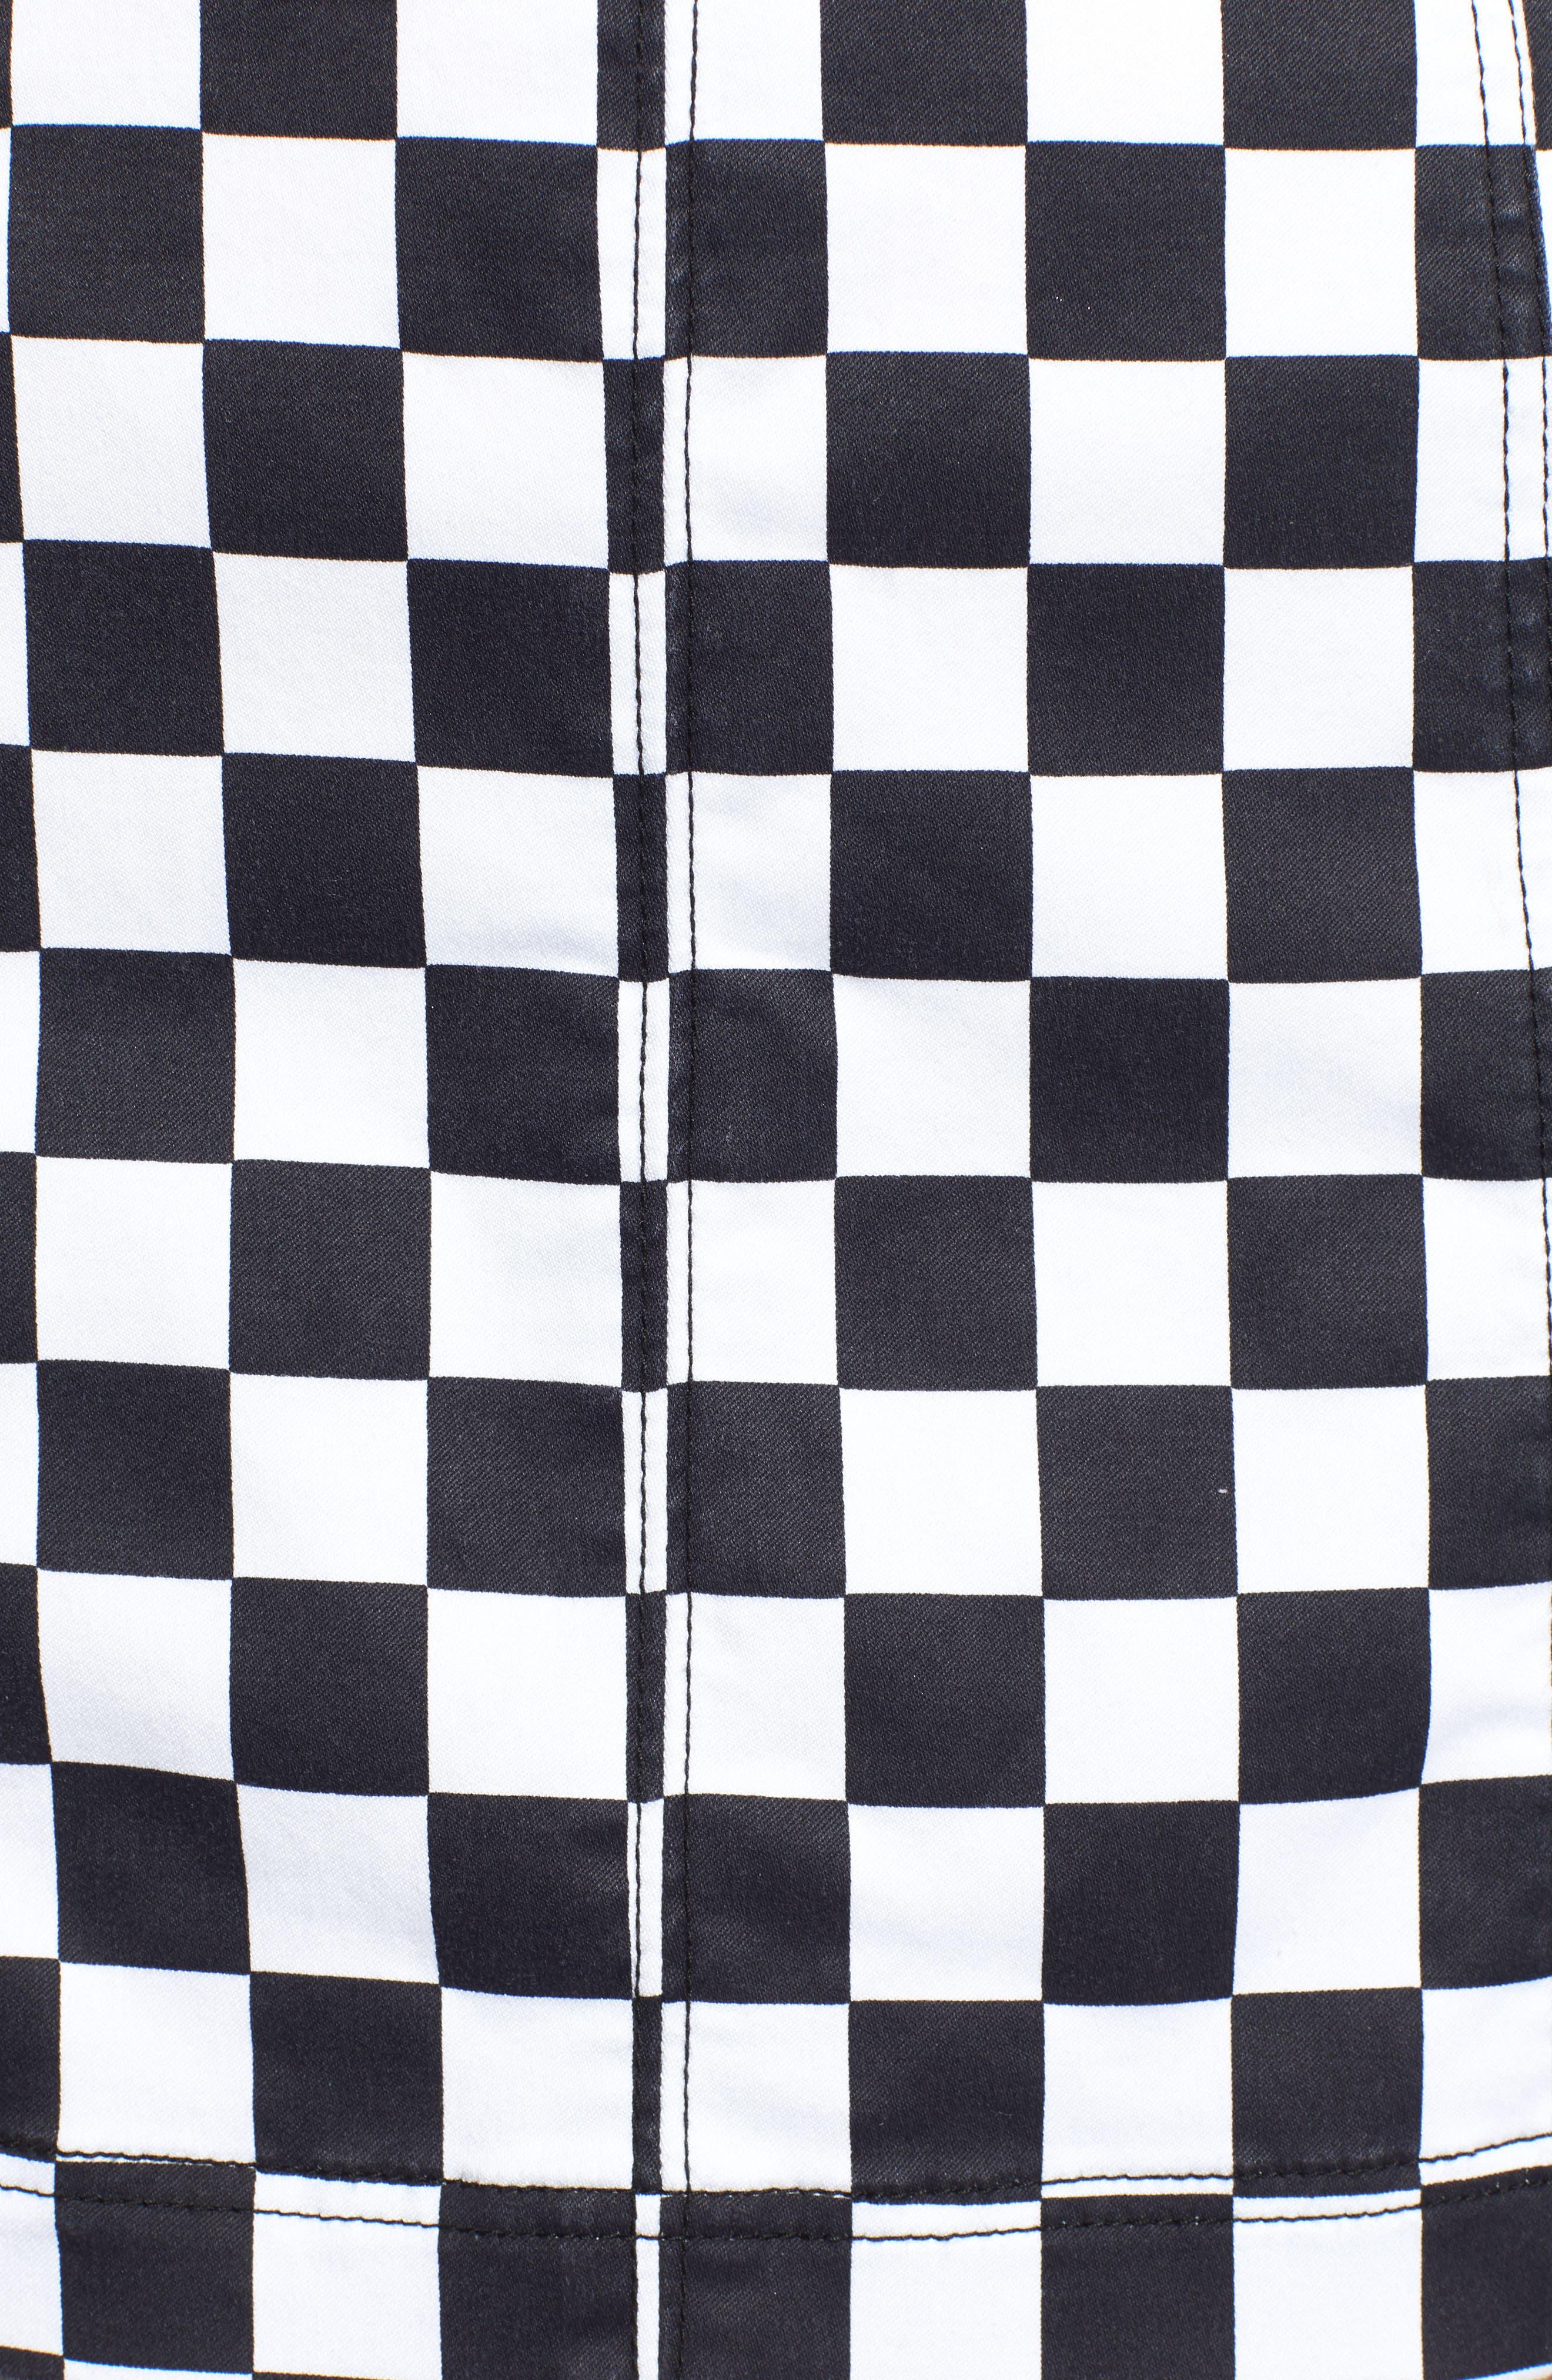 Checkered Denim Miniskirt,                             Alternate thumbnail 5, color,                             BLACK/ WHITE CHECKERED